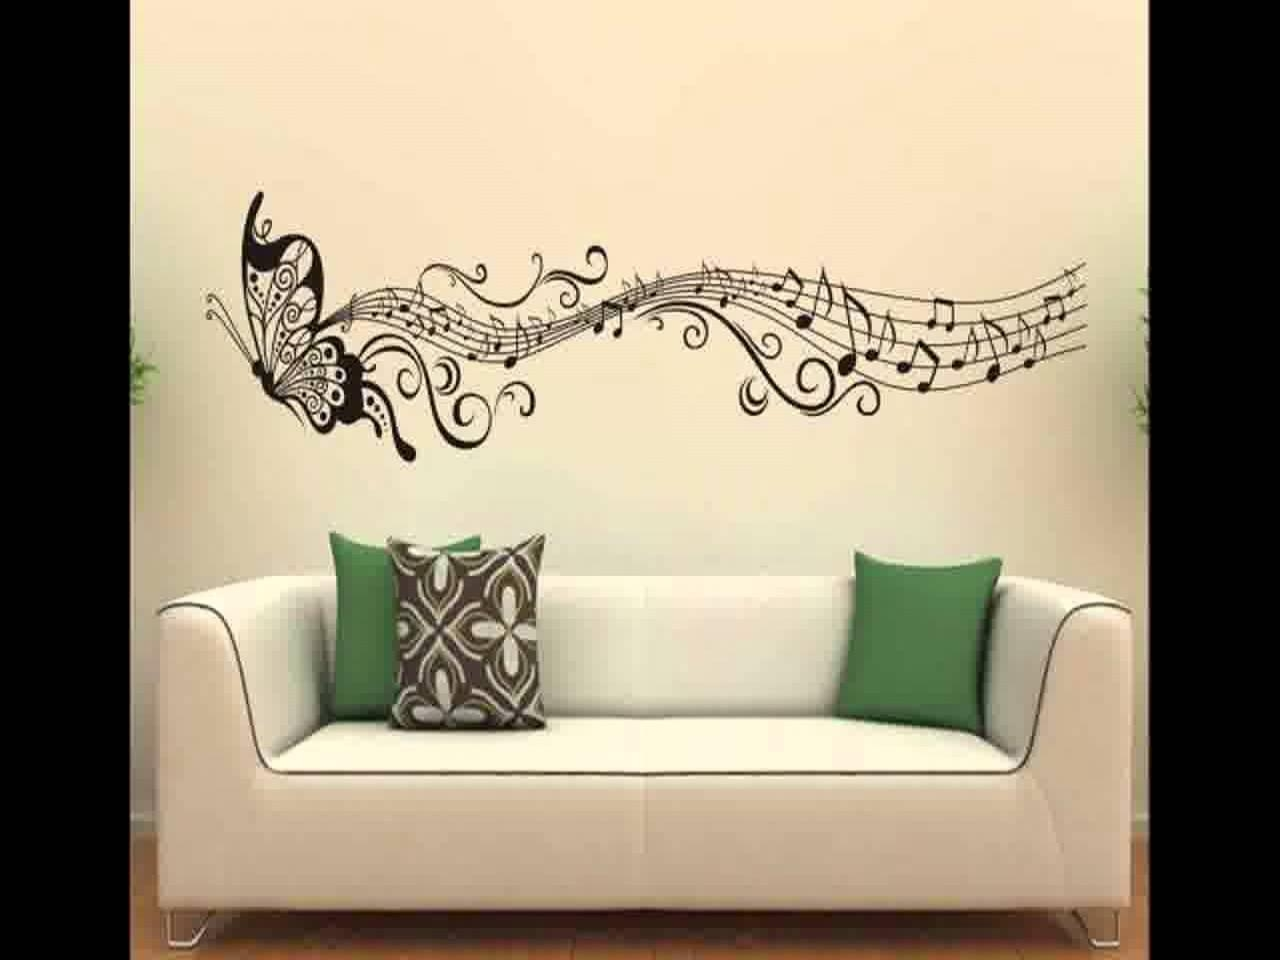 Acrylic Wall Art Design Ideas – Youtube Regarding Wall Art Designs (Image 2 of 20)